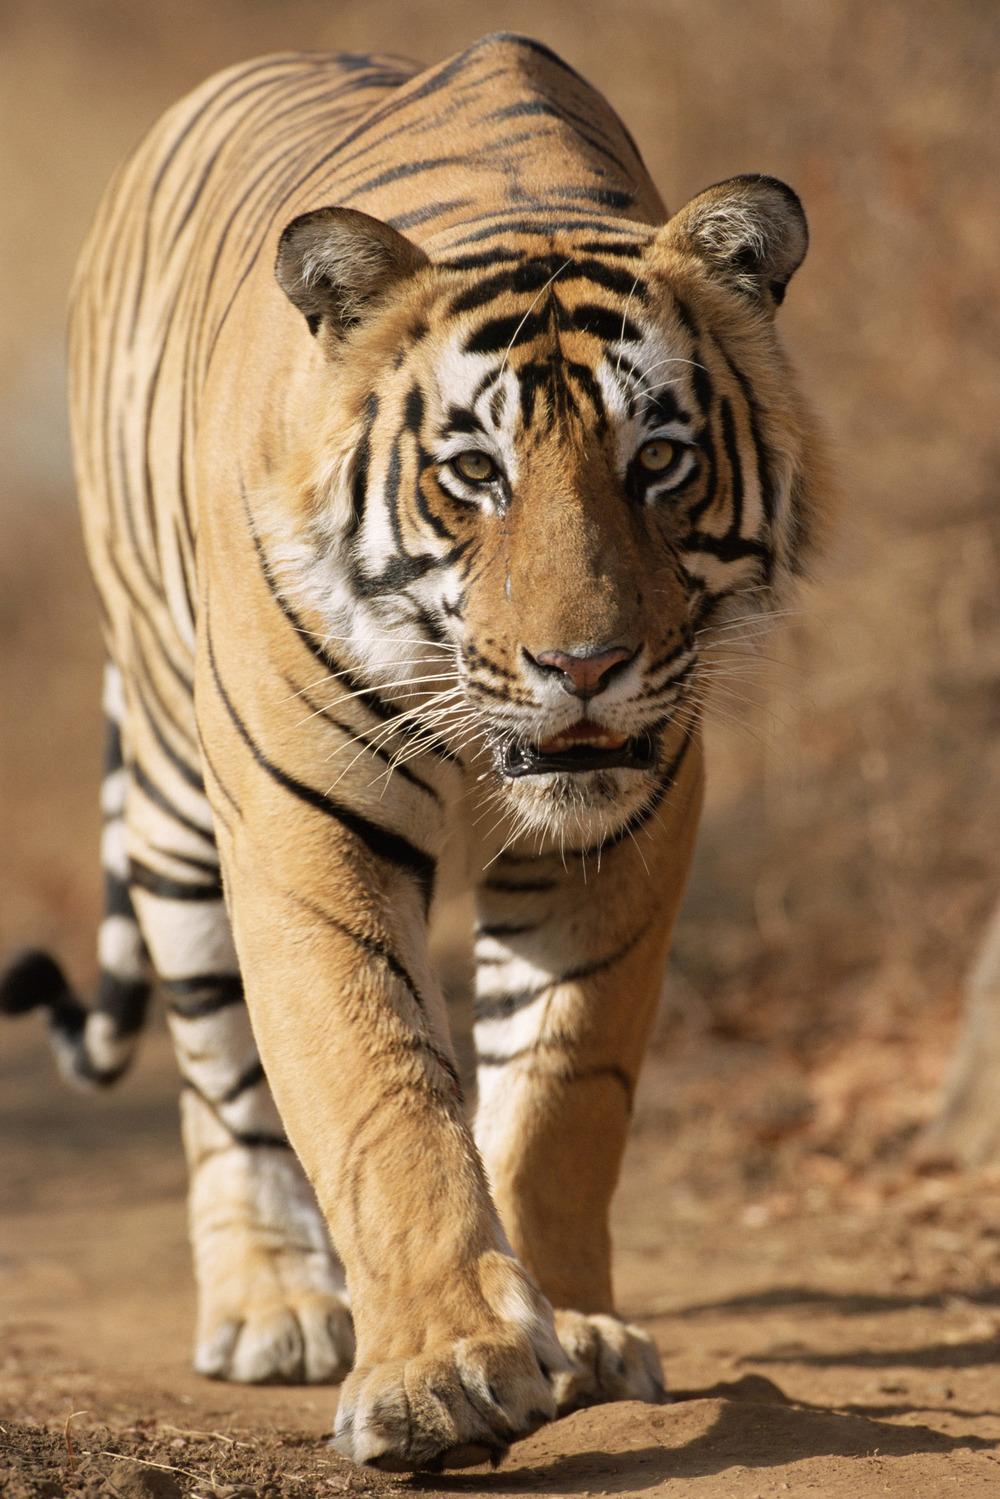 Bengal tiger approaching, Ranthambhore National Park, Rajasthan, India